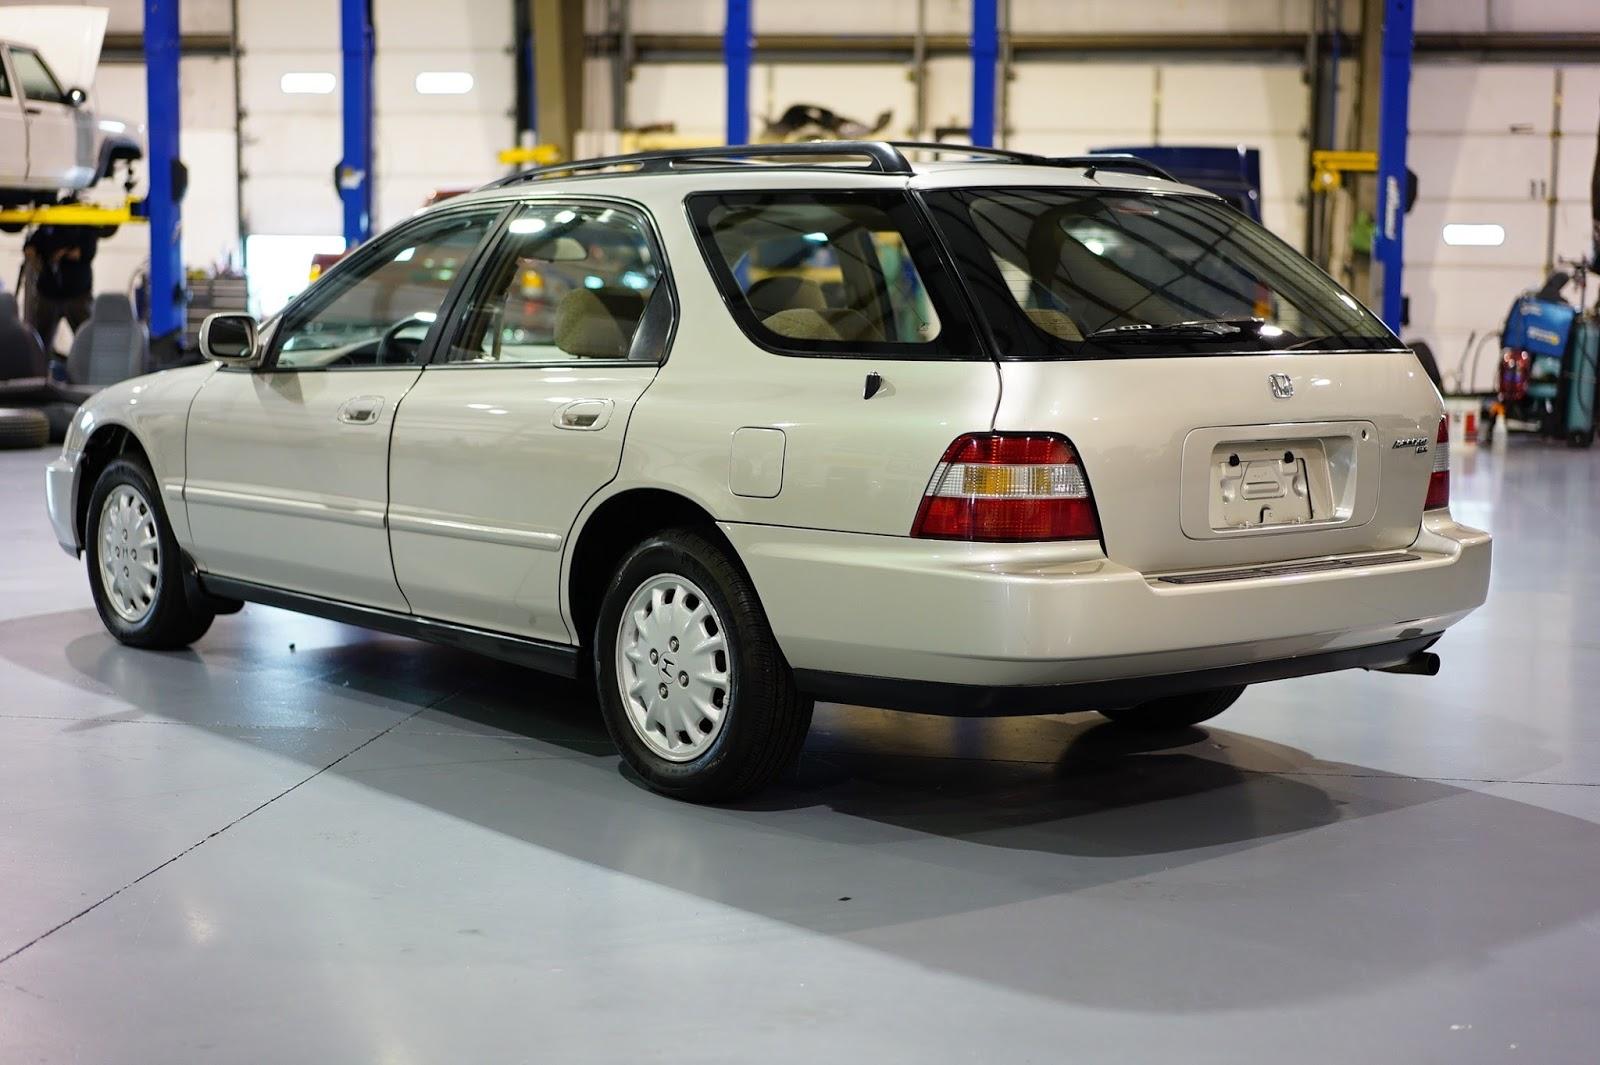 auction watch 1996 honda accord ex wagon 5 door dailyturismo auction watch 1996 honda accord ex